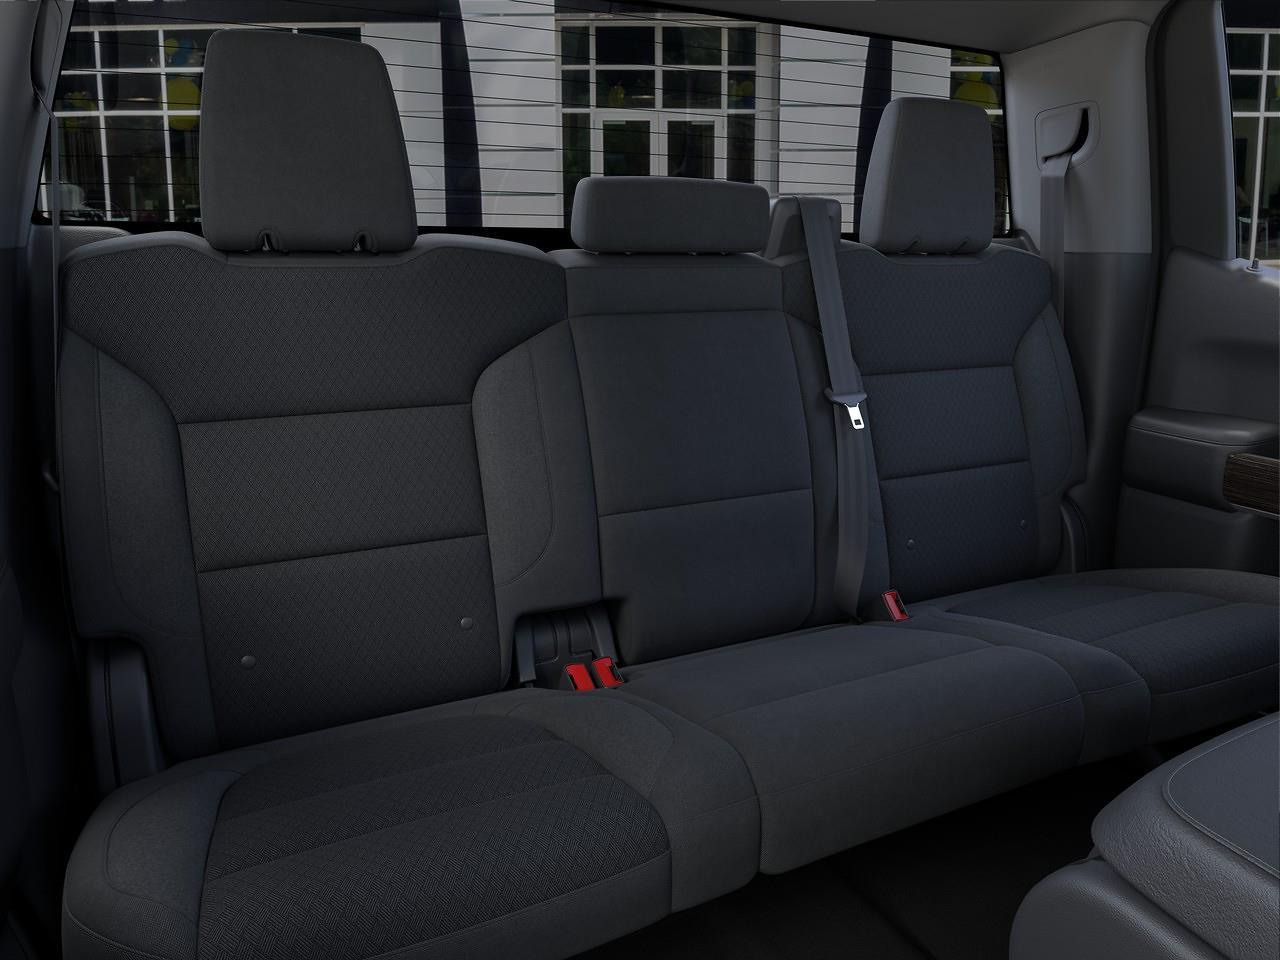 2021 GMC Sierra 1500 Double Cab 4x4, Pickup #ST21273 - photo 34